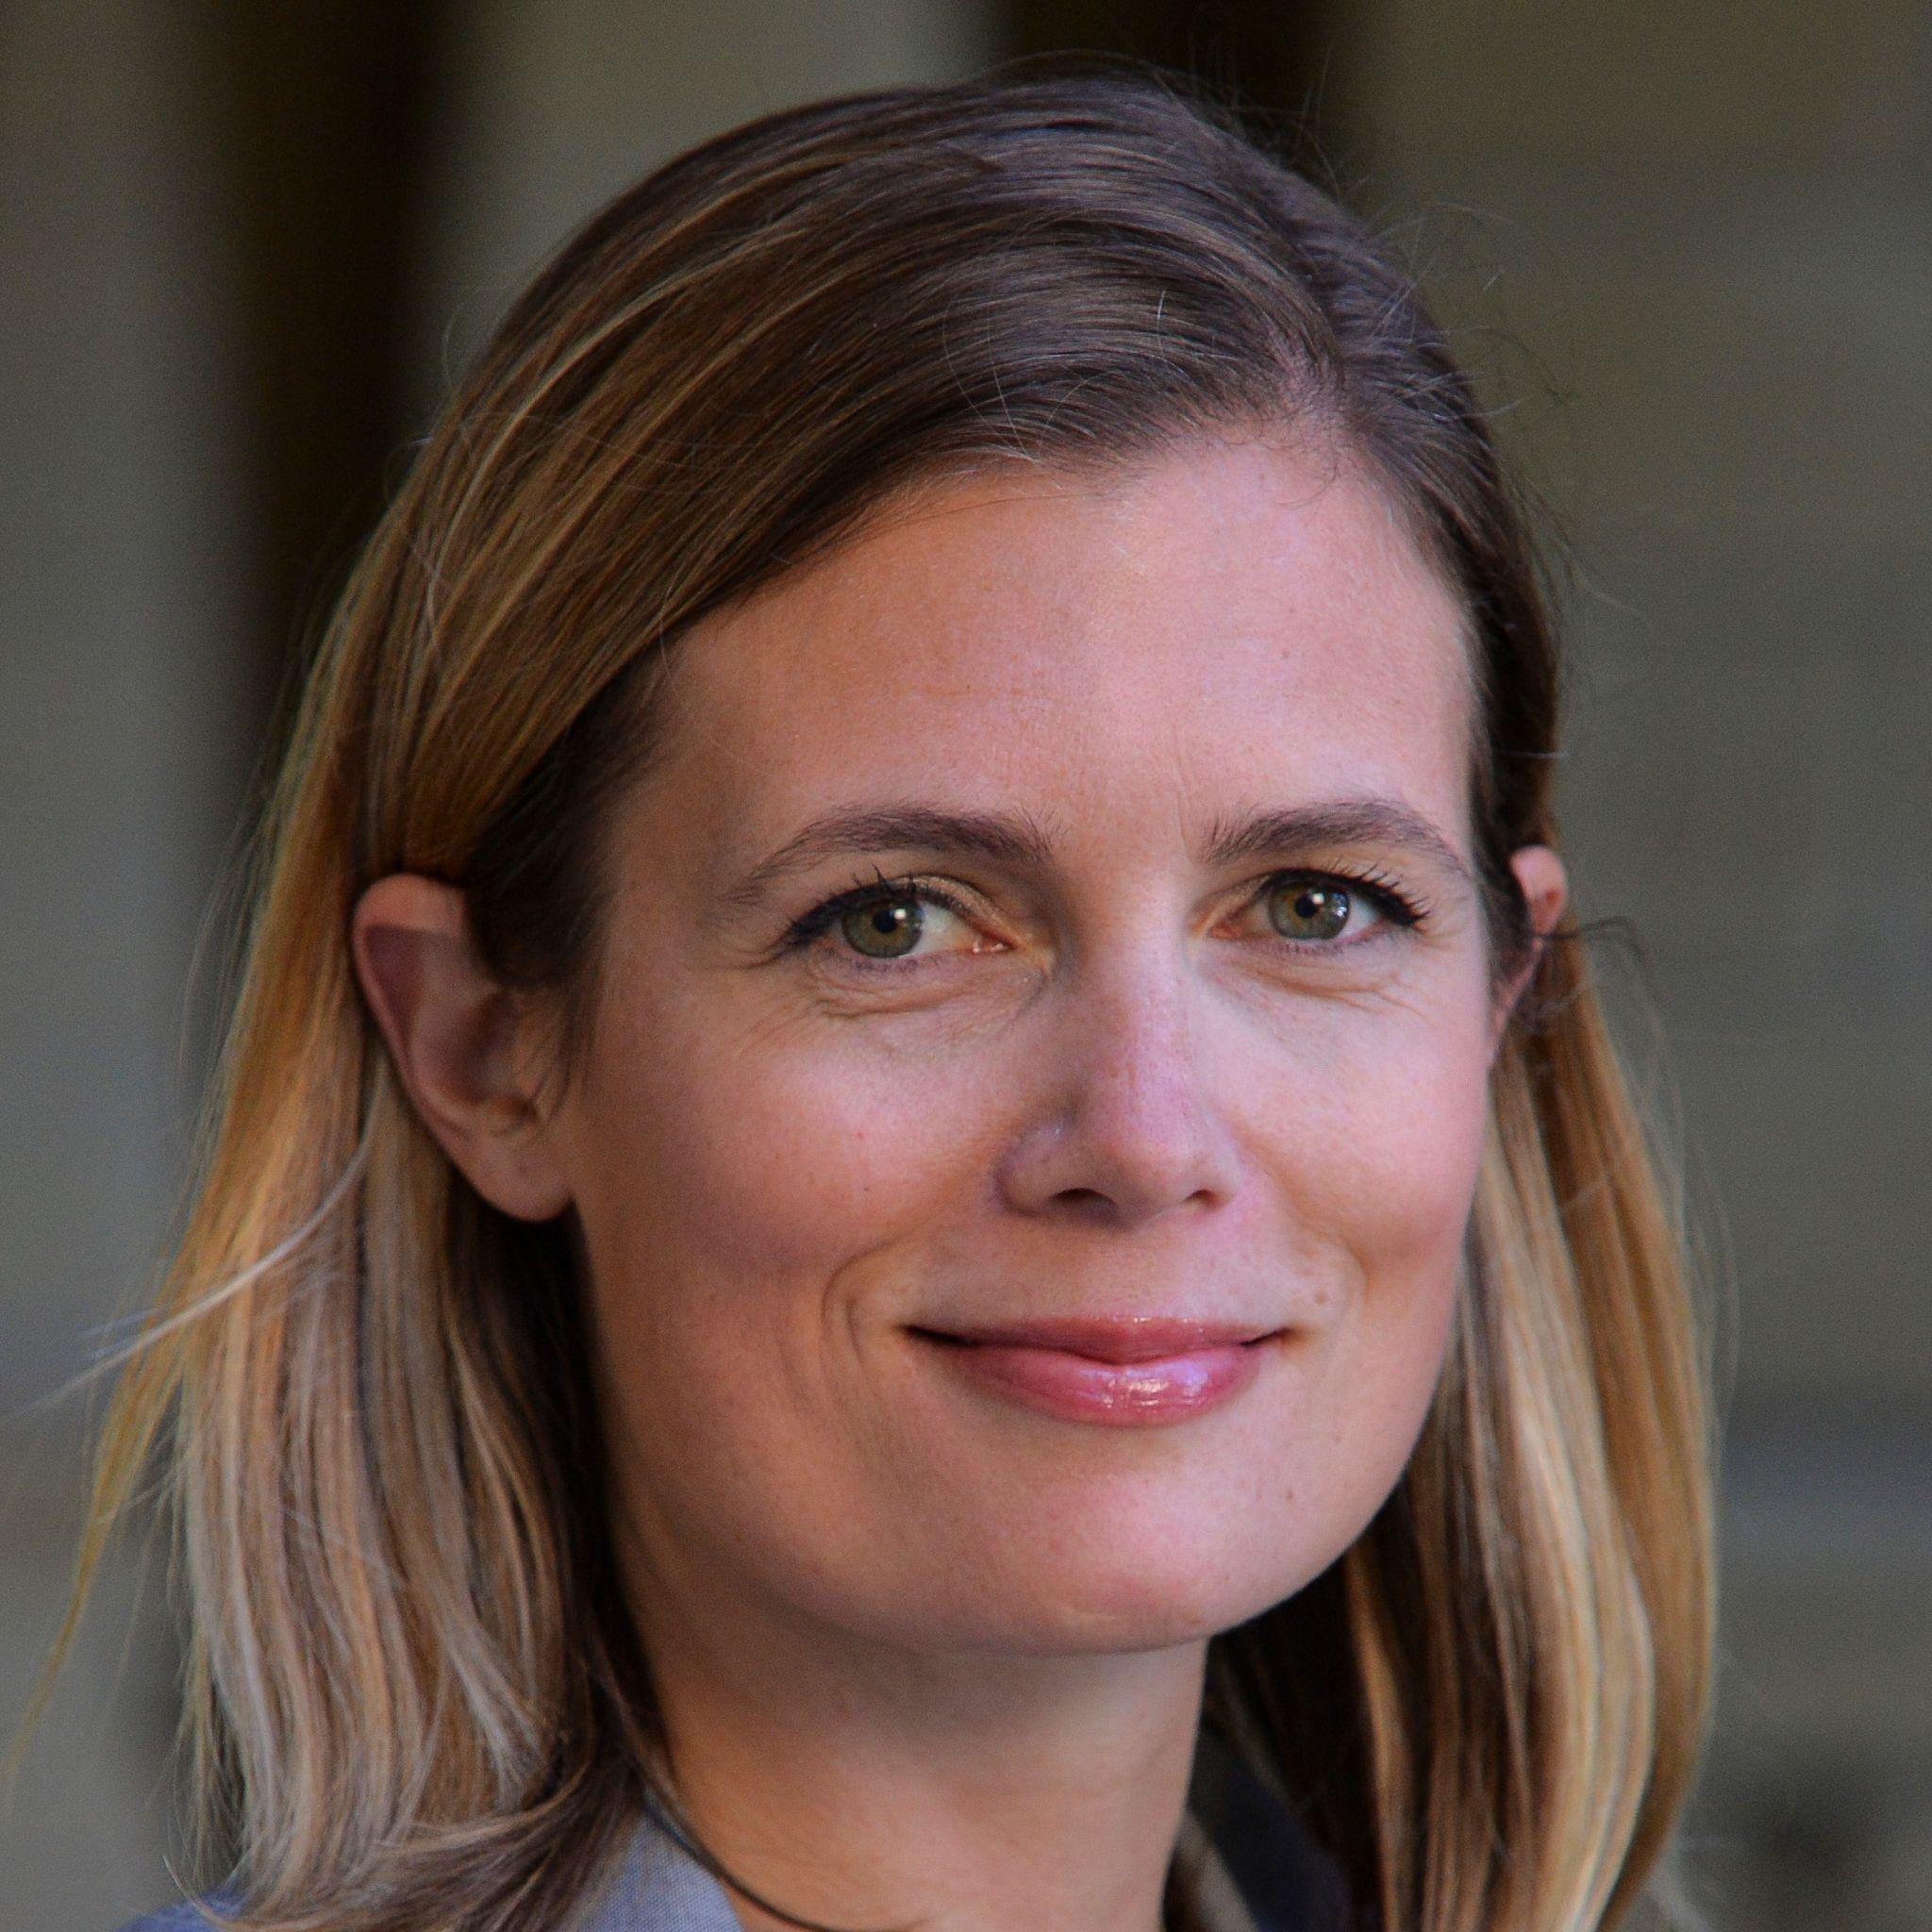 Kristin Ven Bruusgaard